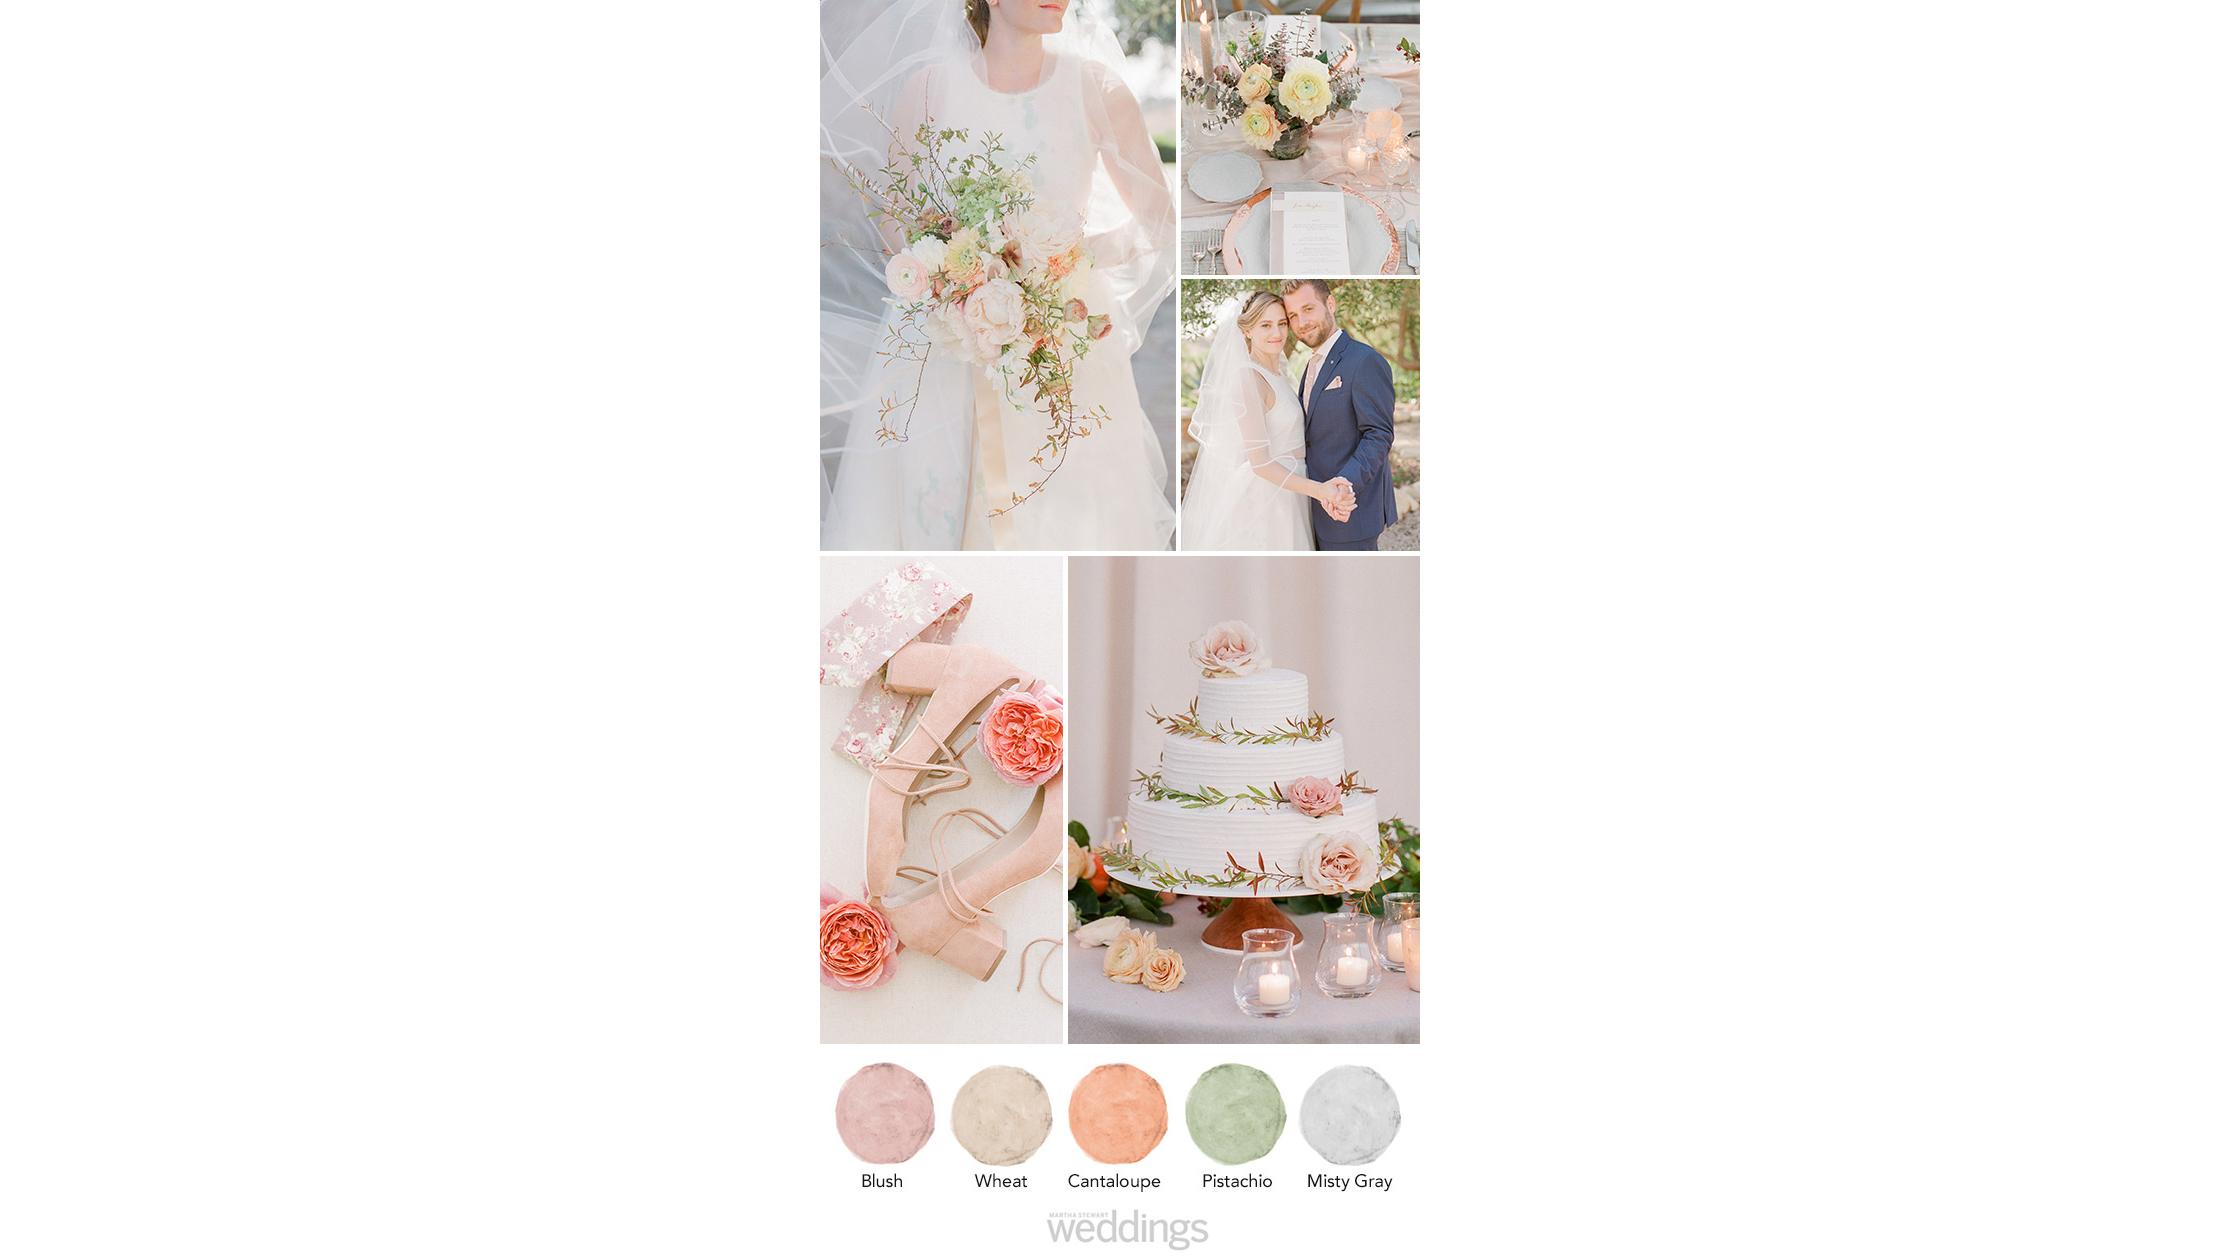 blush gray wheat wedding color palette ideas